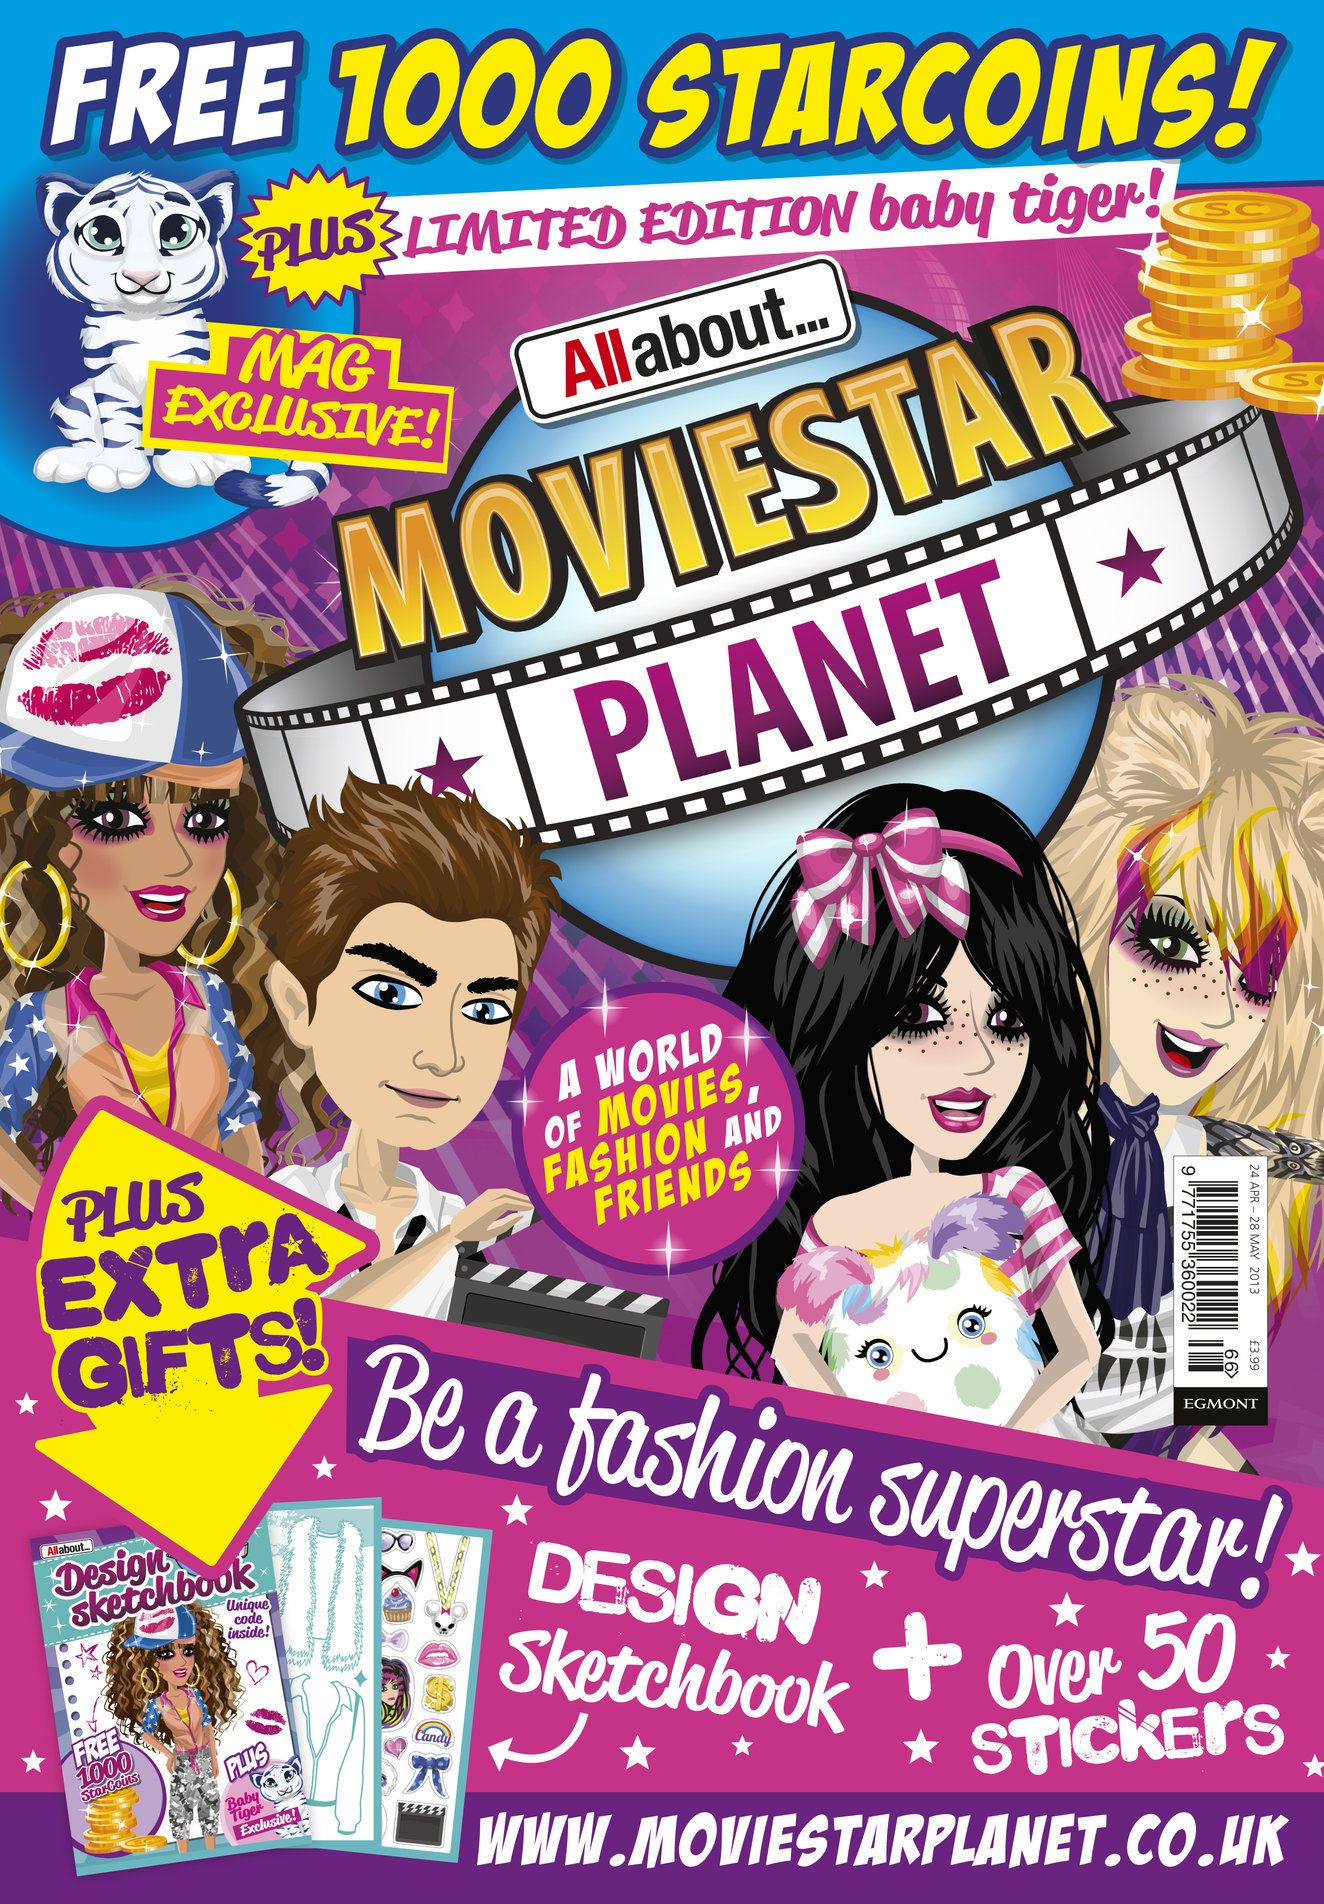 Egmont Magazine Licensing Moviestarplanet Moviestarplanet Magazine Sketch Book